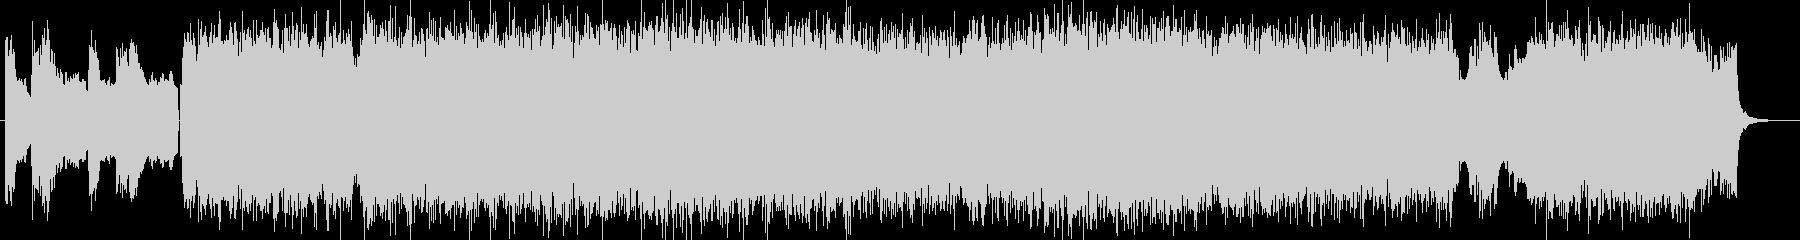 「HR/HM」「DARK」BGM91の未再生の波形